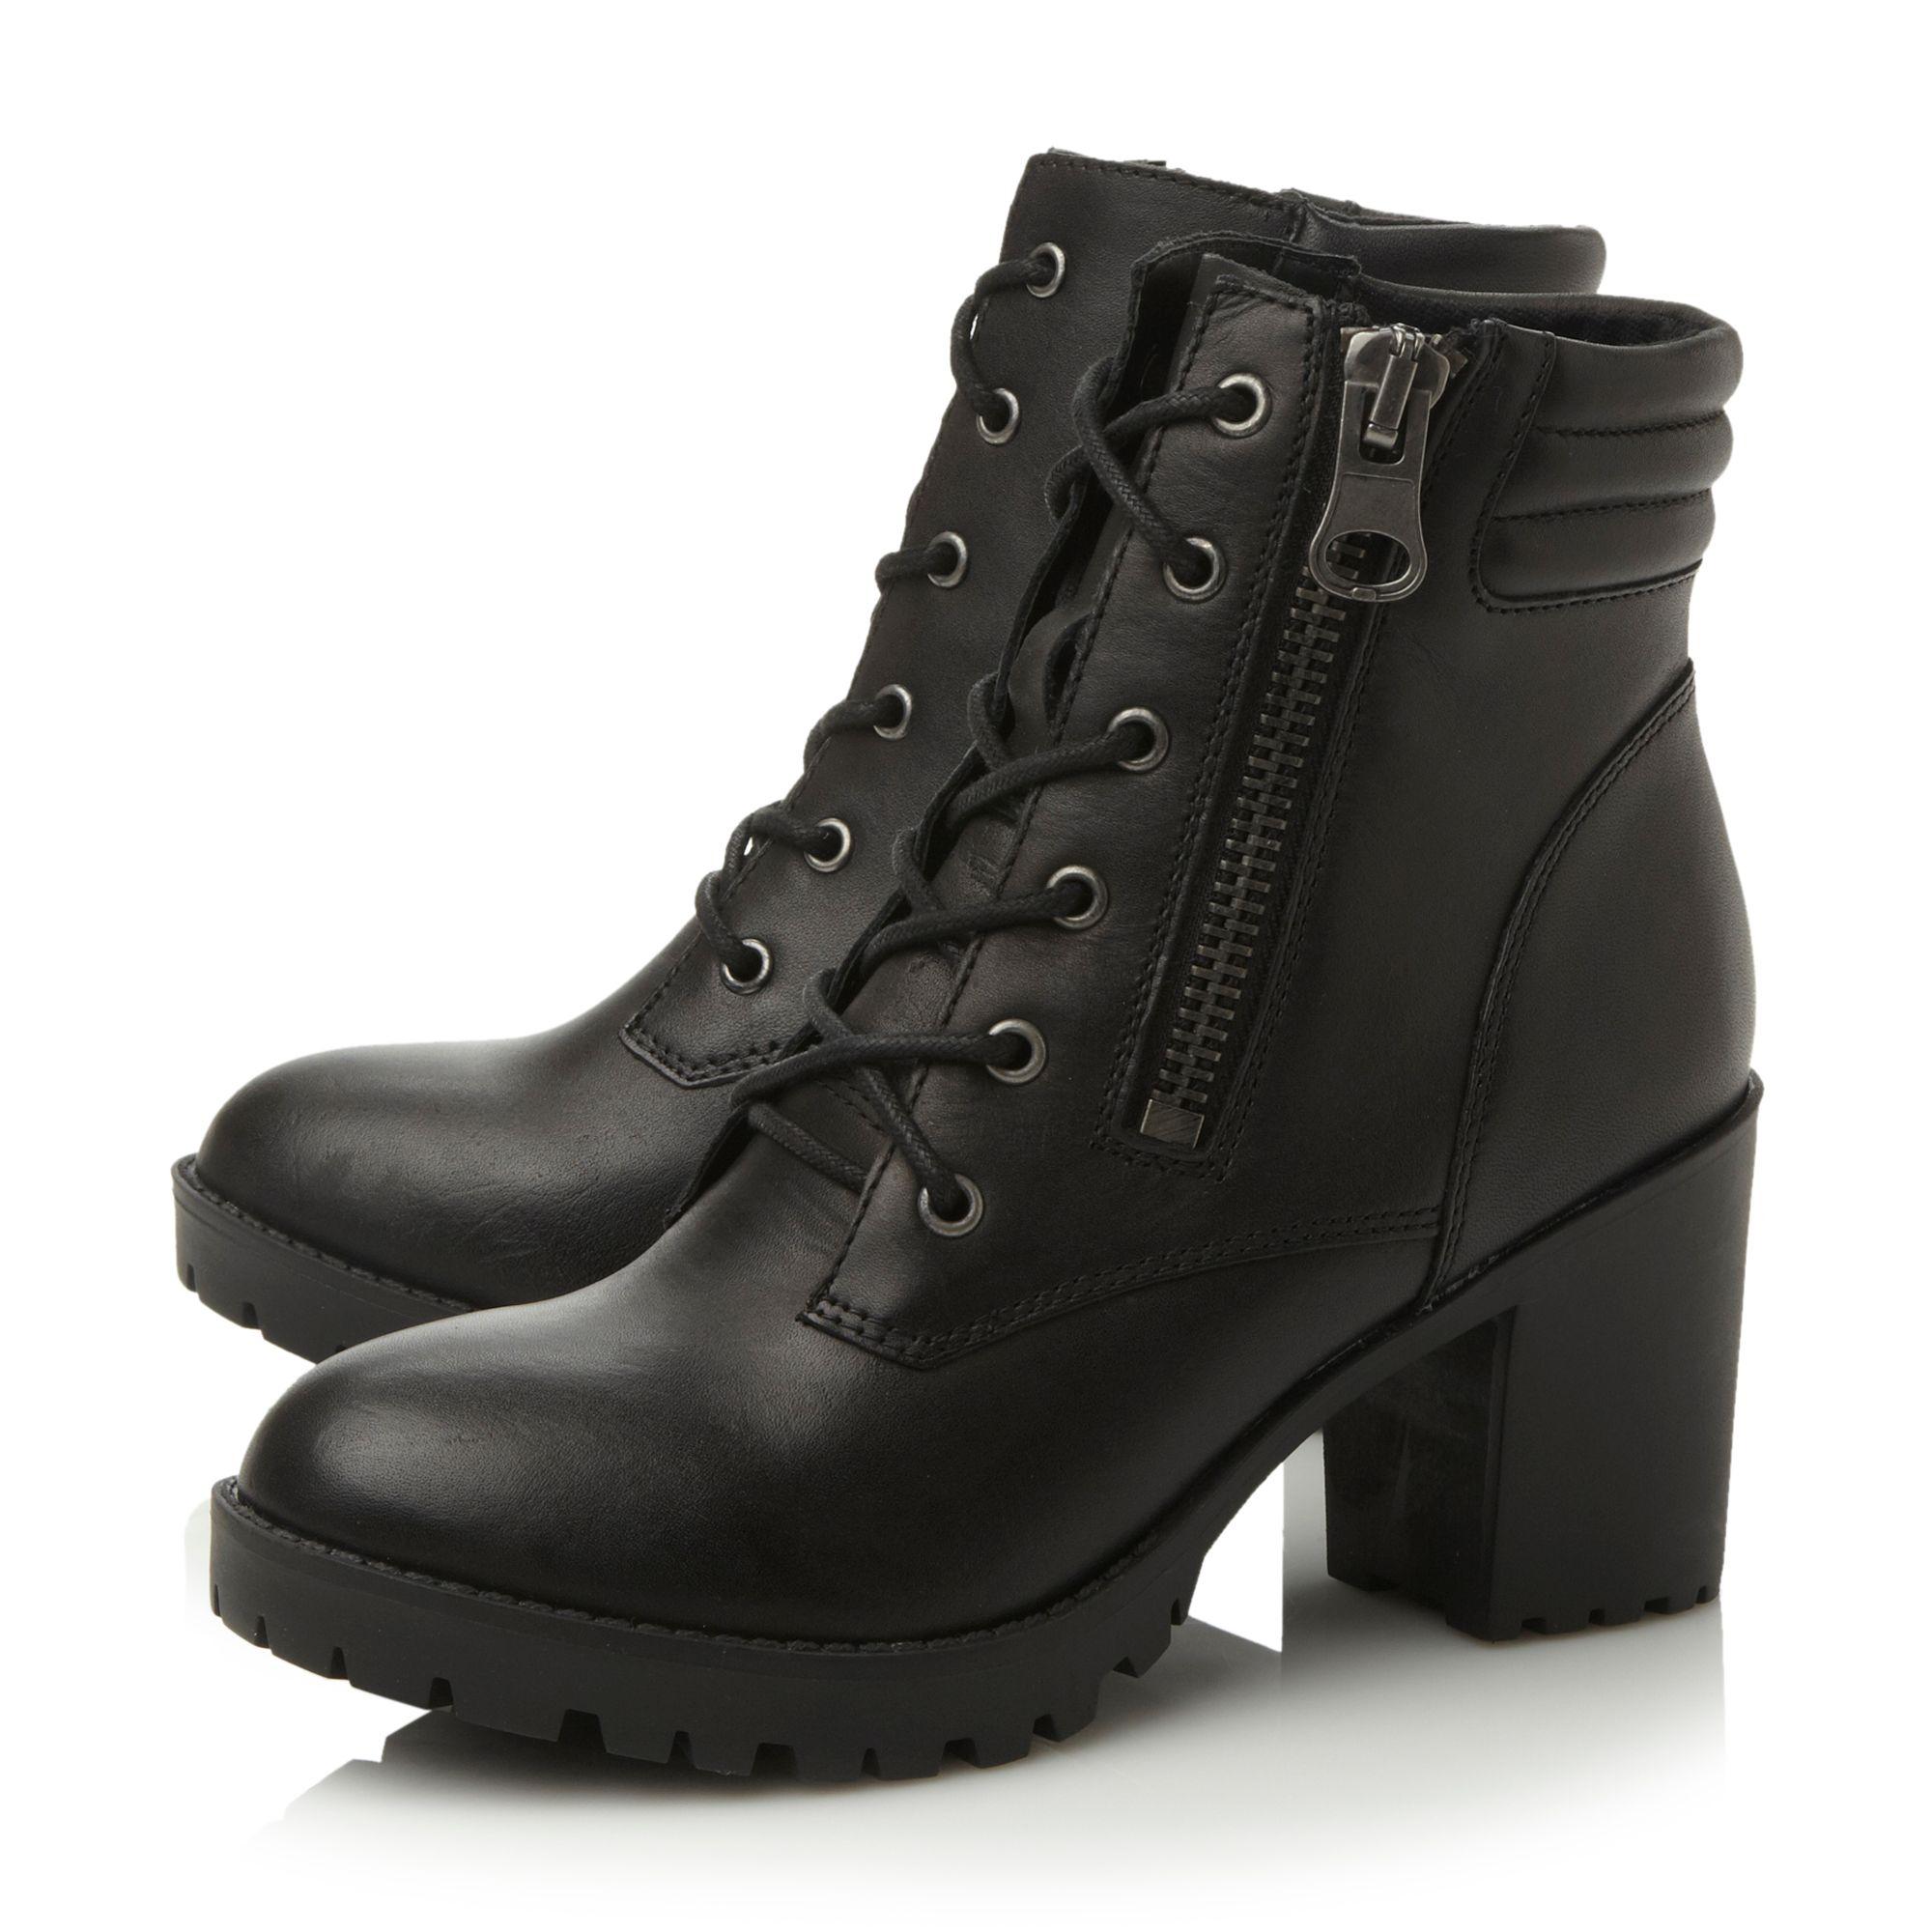 Steve Madden Black Lace Up Shoes